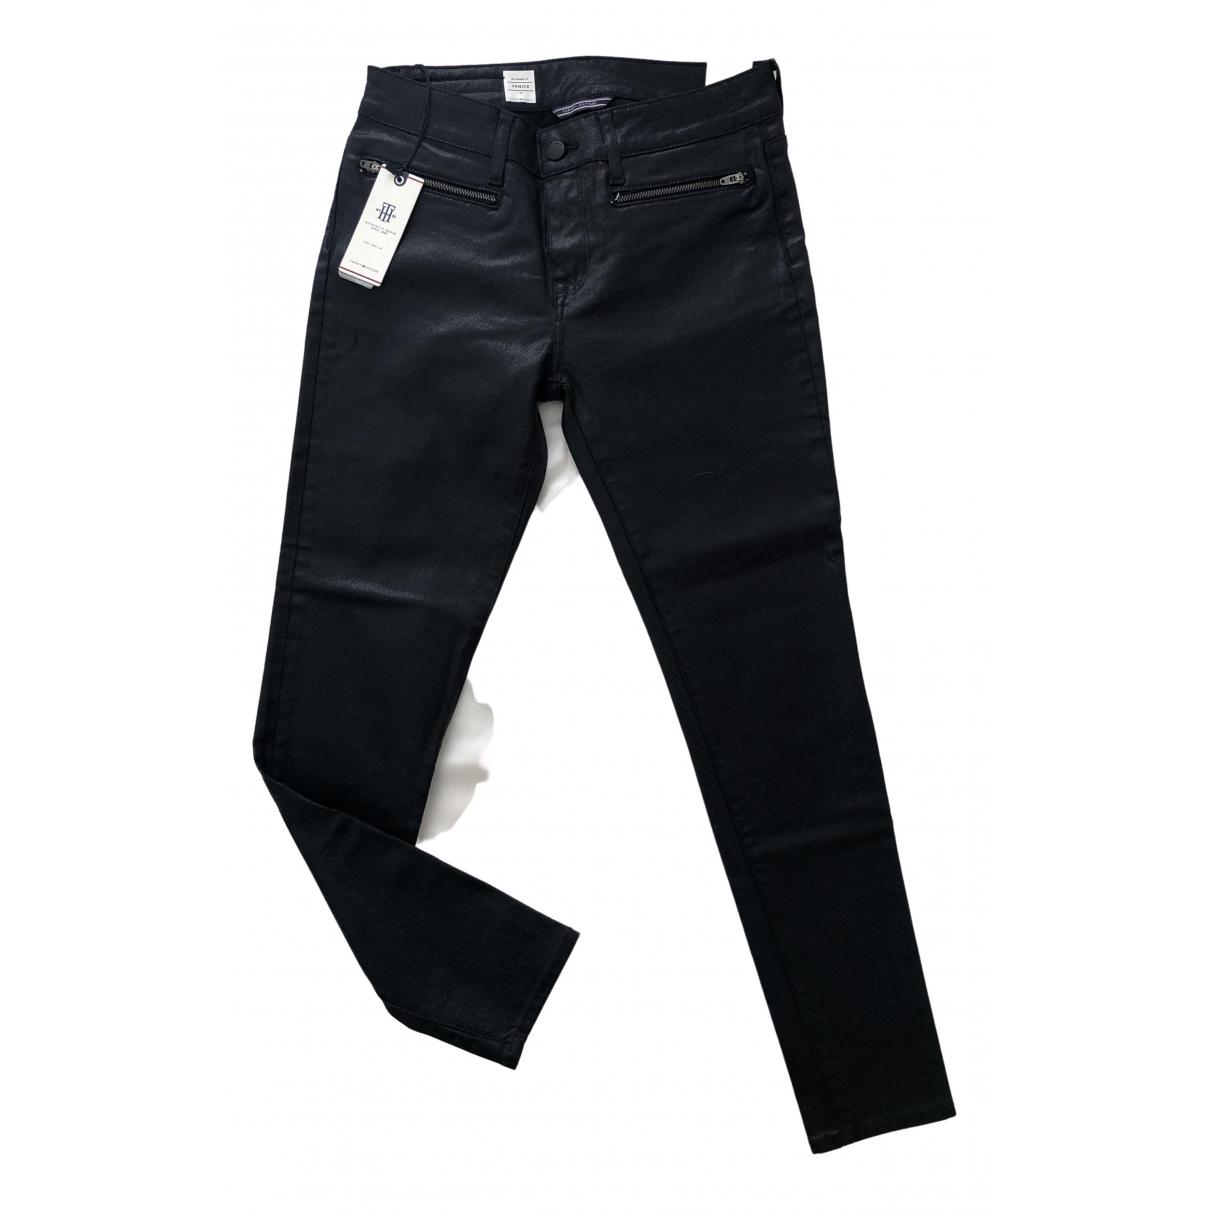 Tommy Hilfiger \N Black Cotton - elasthane Jeans for Women 27 US